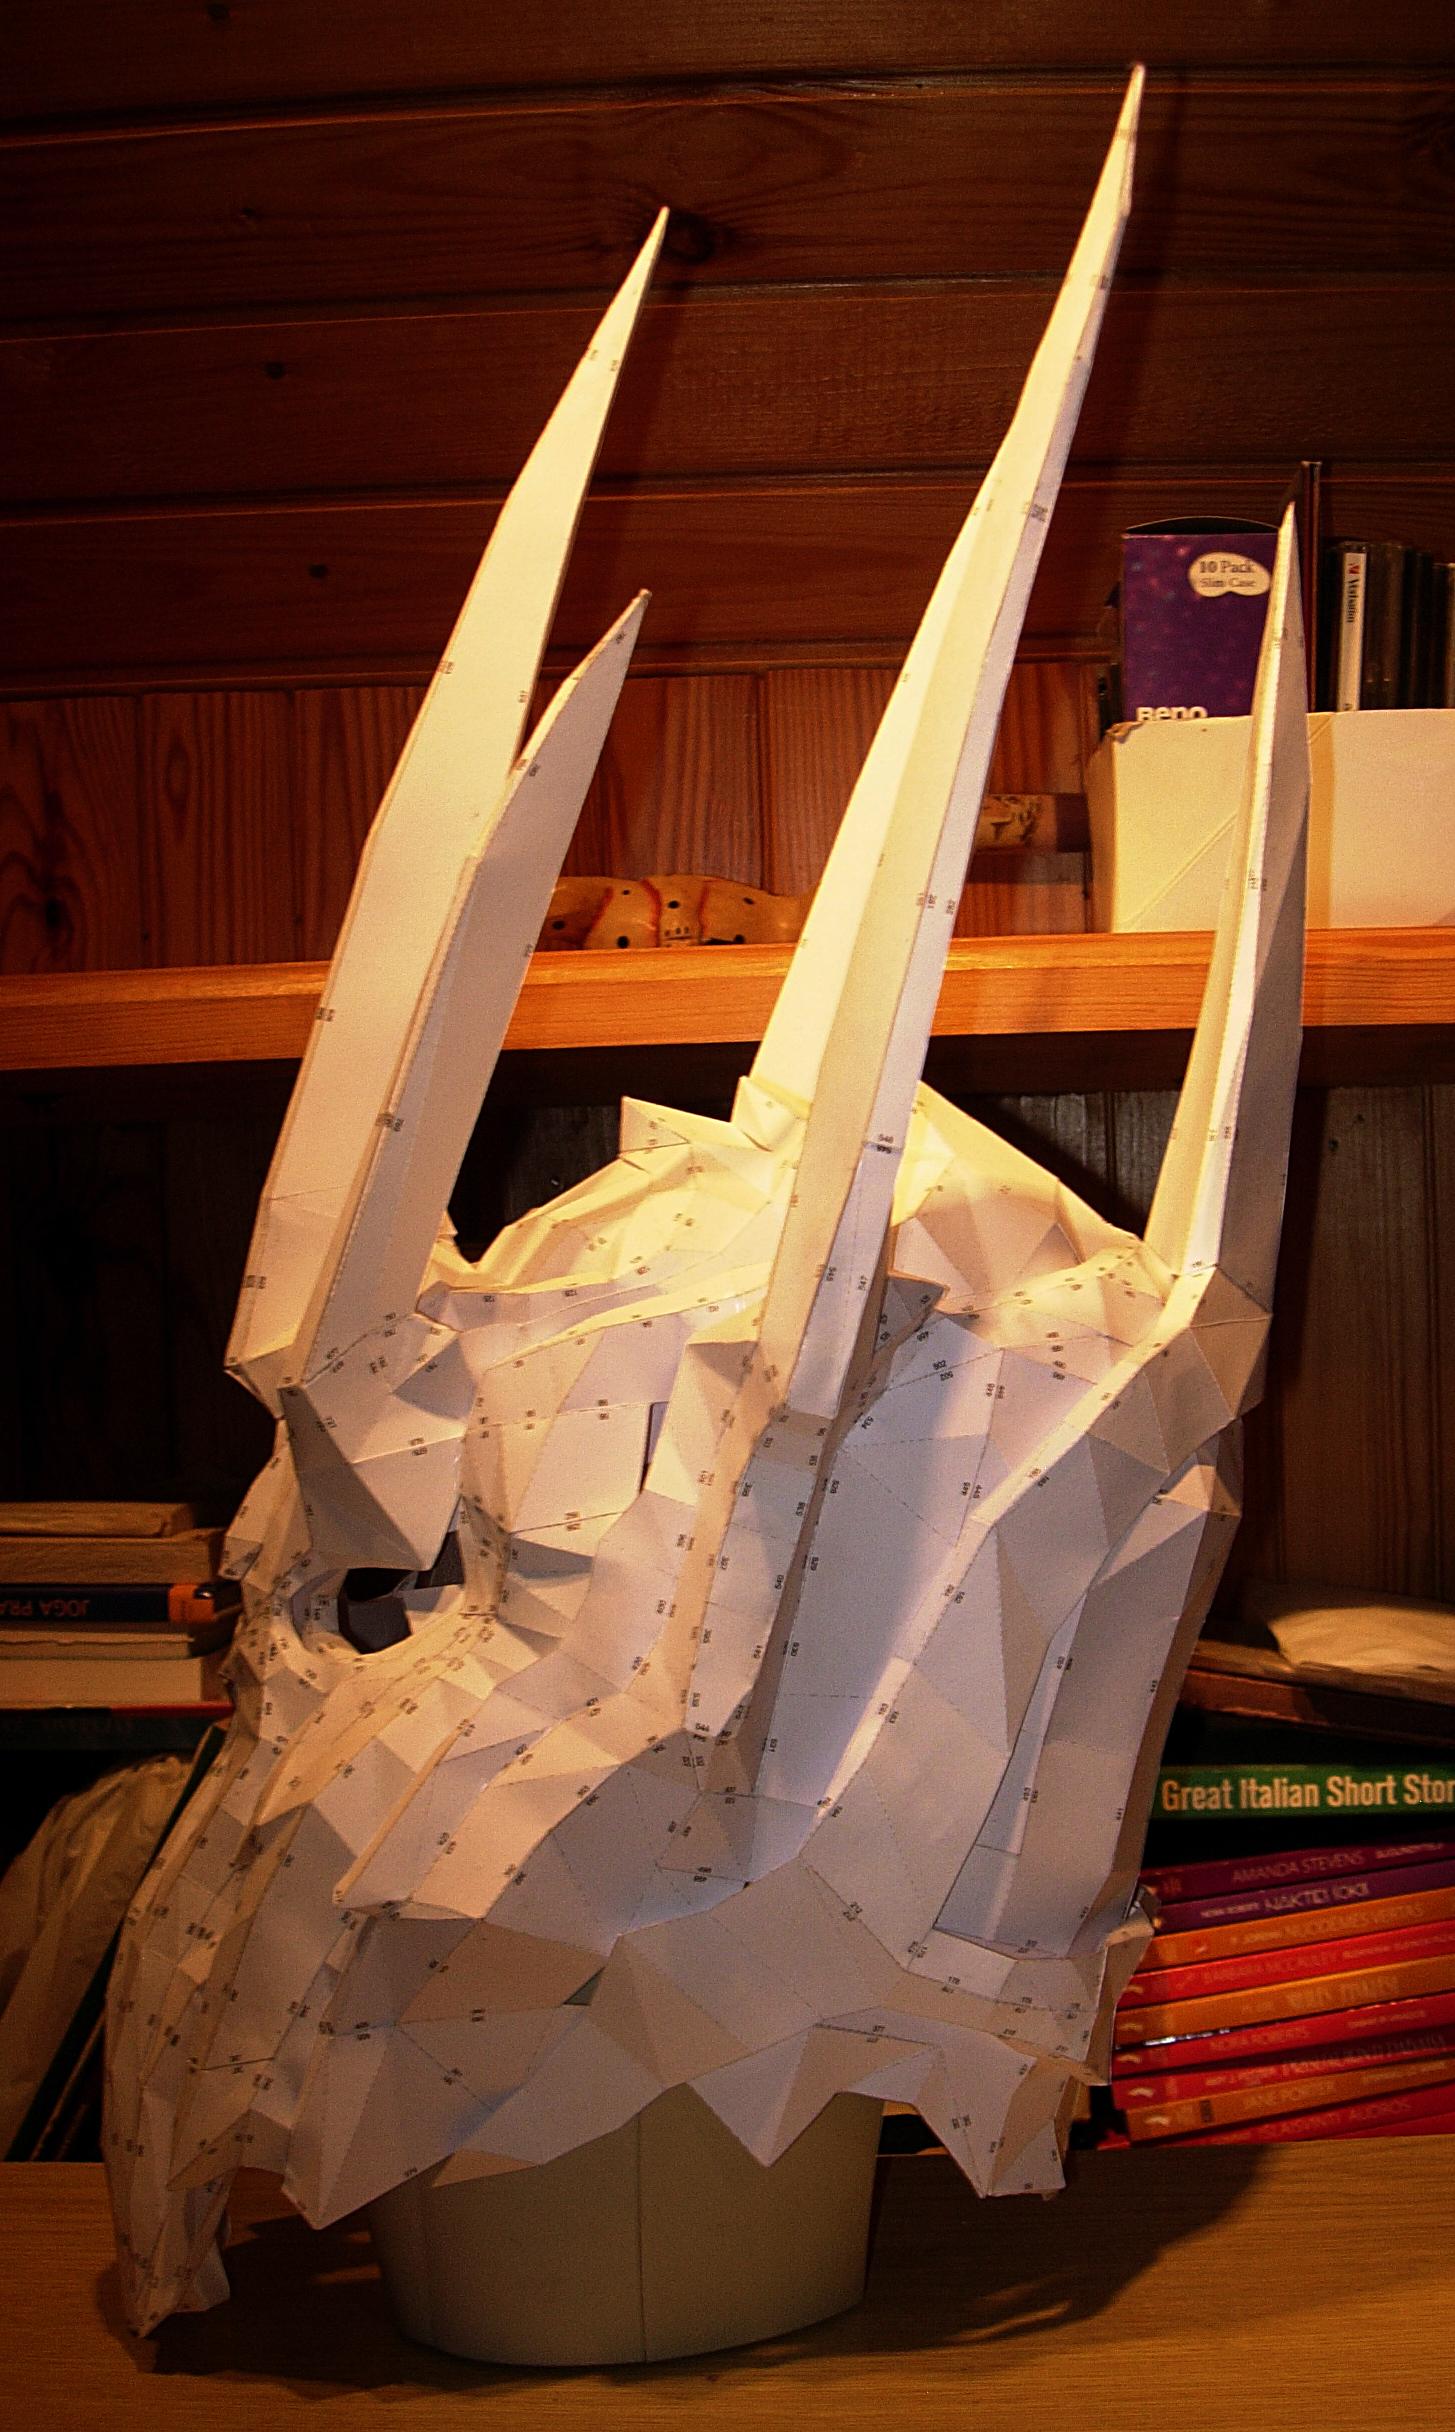 Sauron helmet pepakura model by CubicalMember on DeviantArt